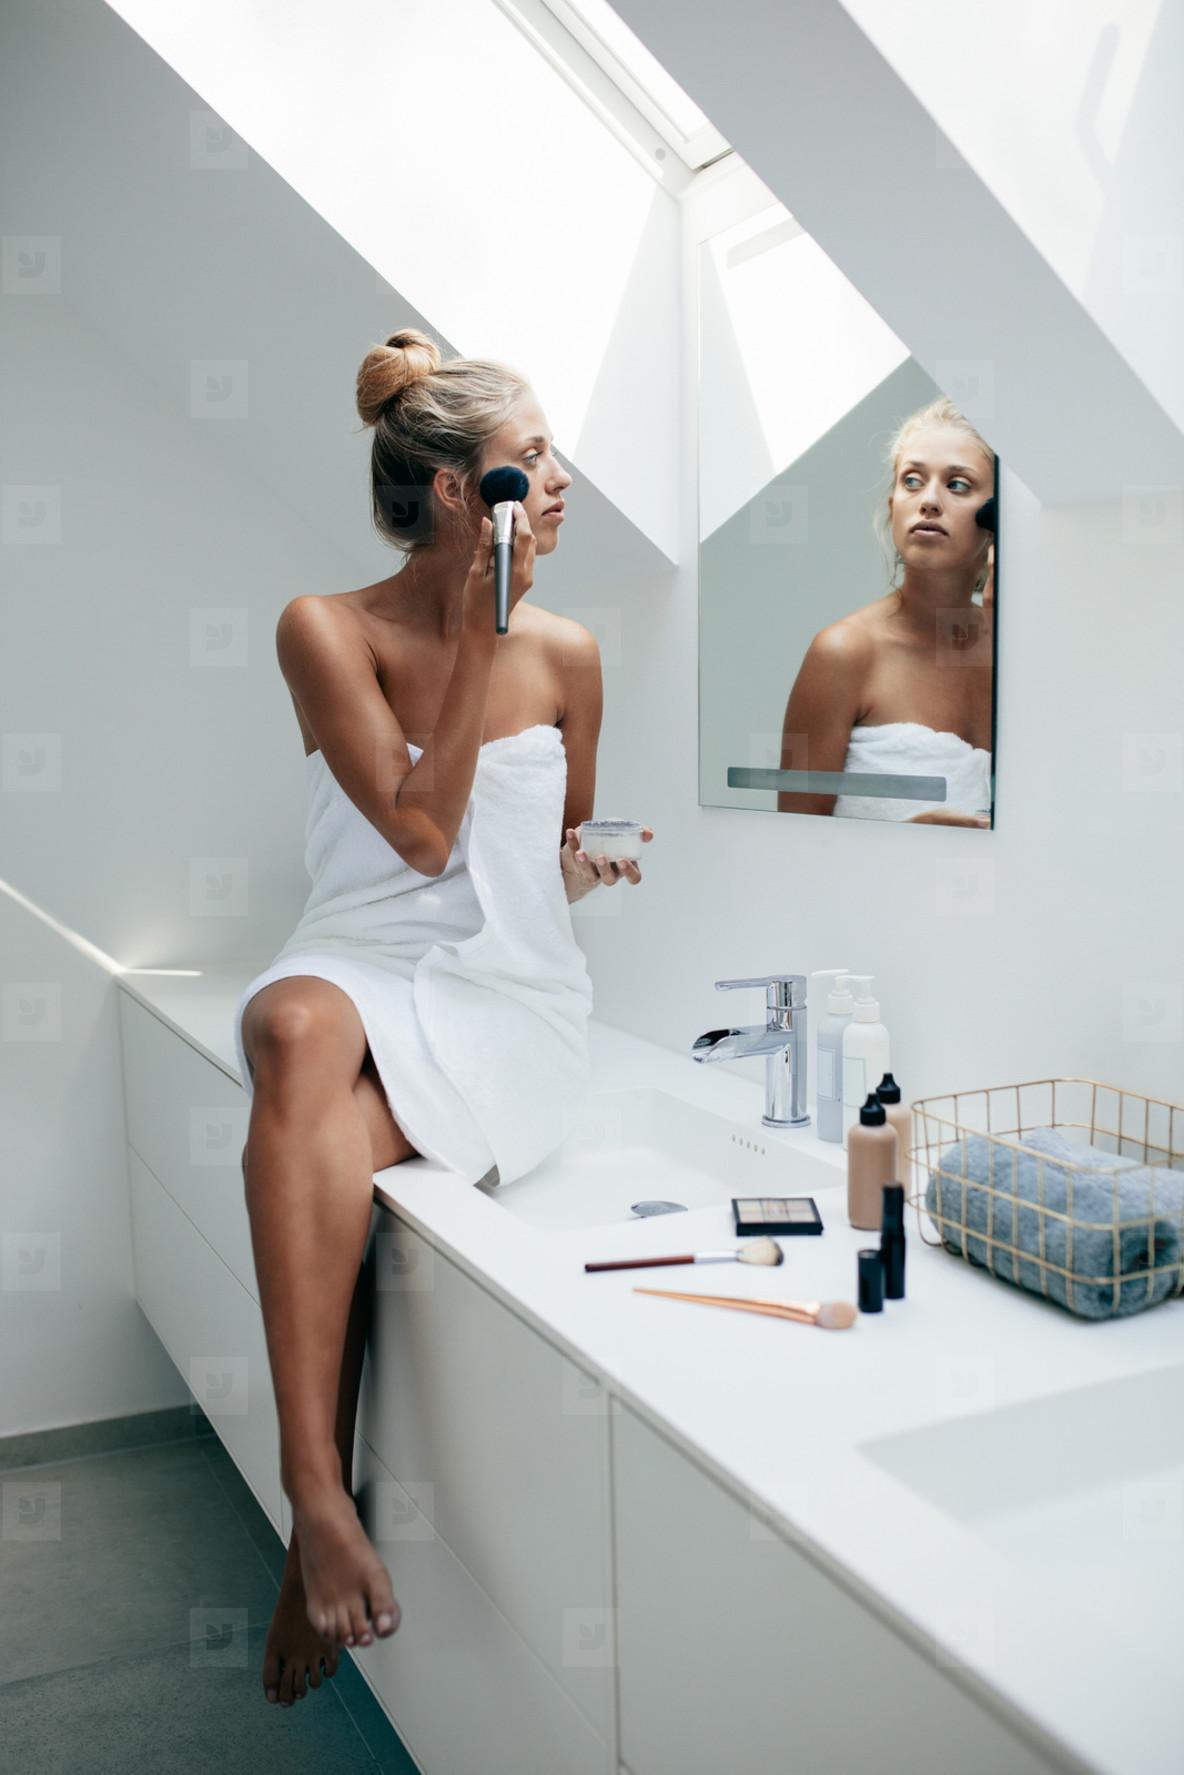 Female putting on makeup in bathroom